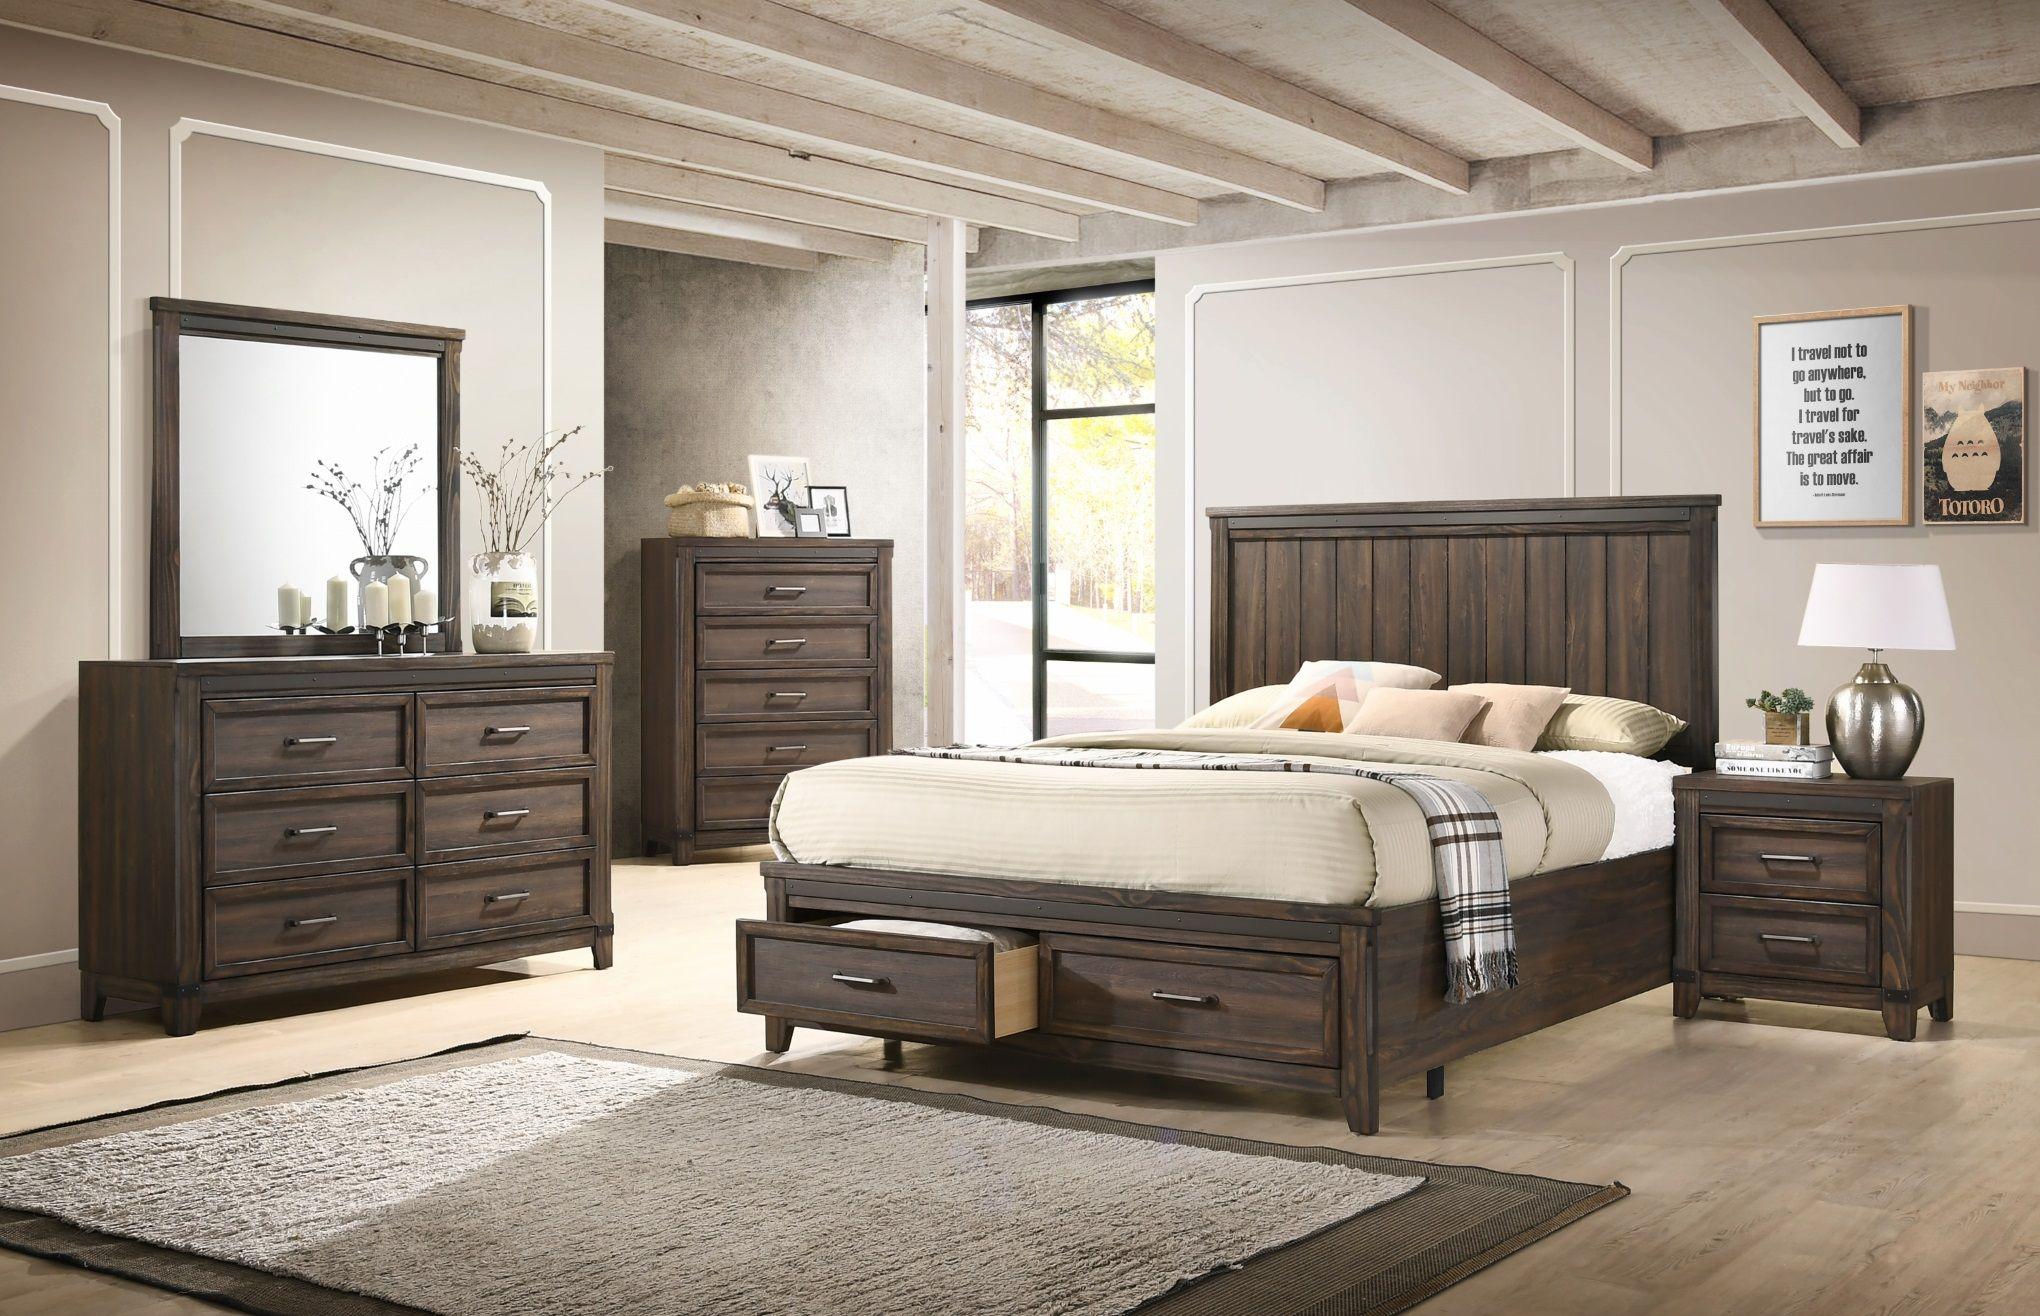 Presley Platform Bedroom Set With Images Platform Bedroom Sets Queen Sized Bedroom Sets Bedroom Sets Queen